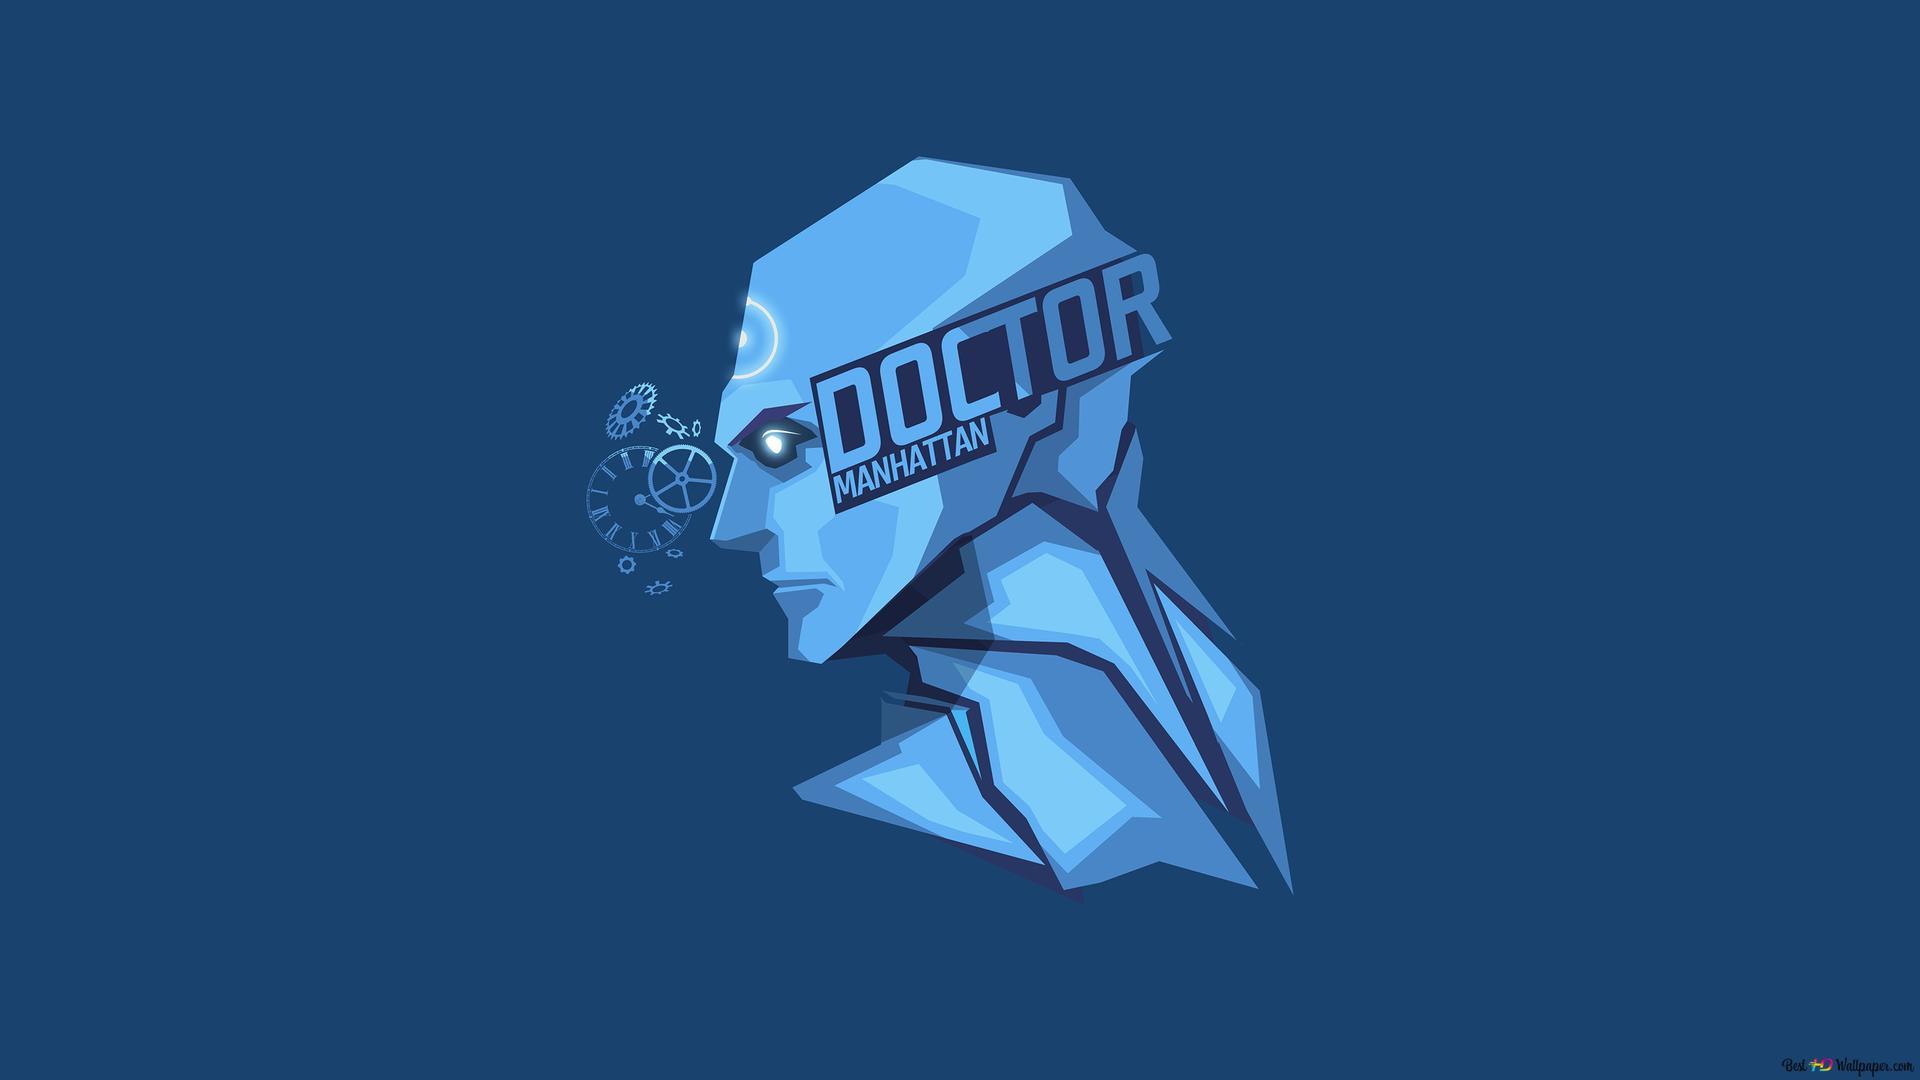 Dc Comics Doctor Manhattan Minimalist Blue Wallpaper Background Hd